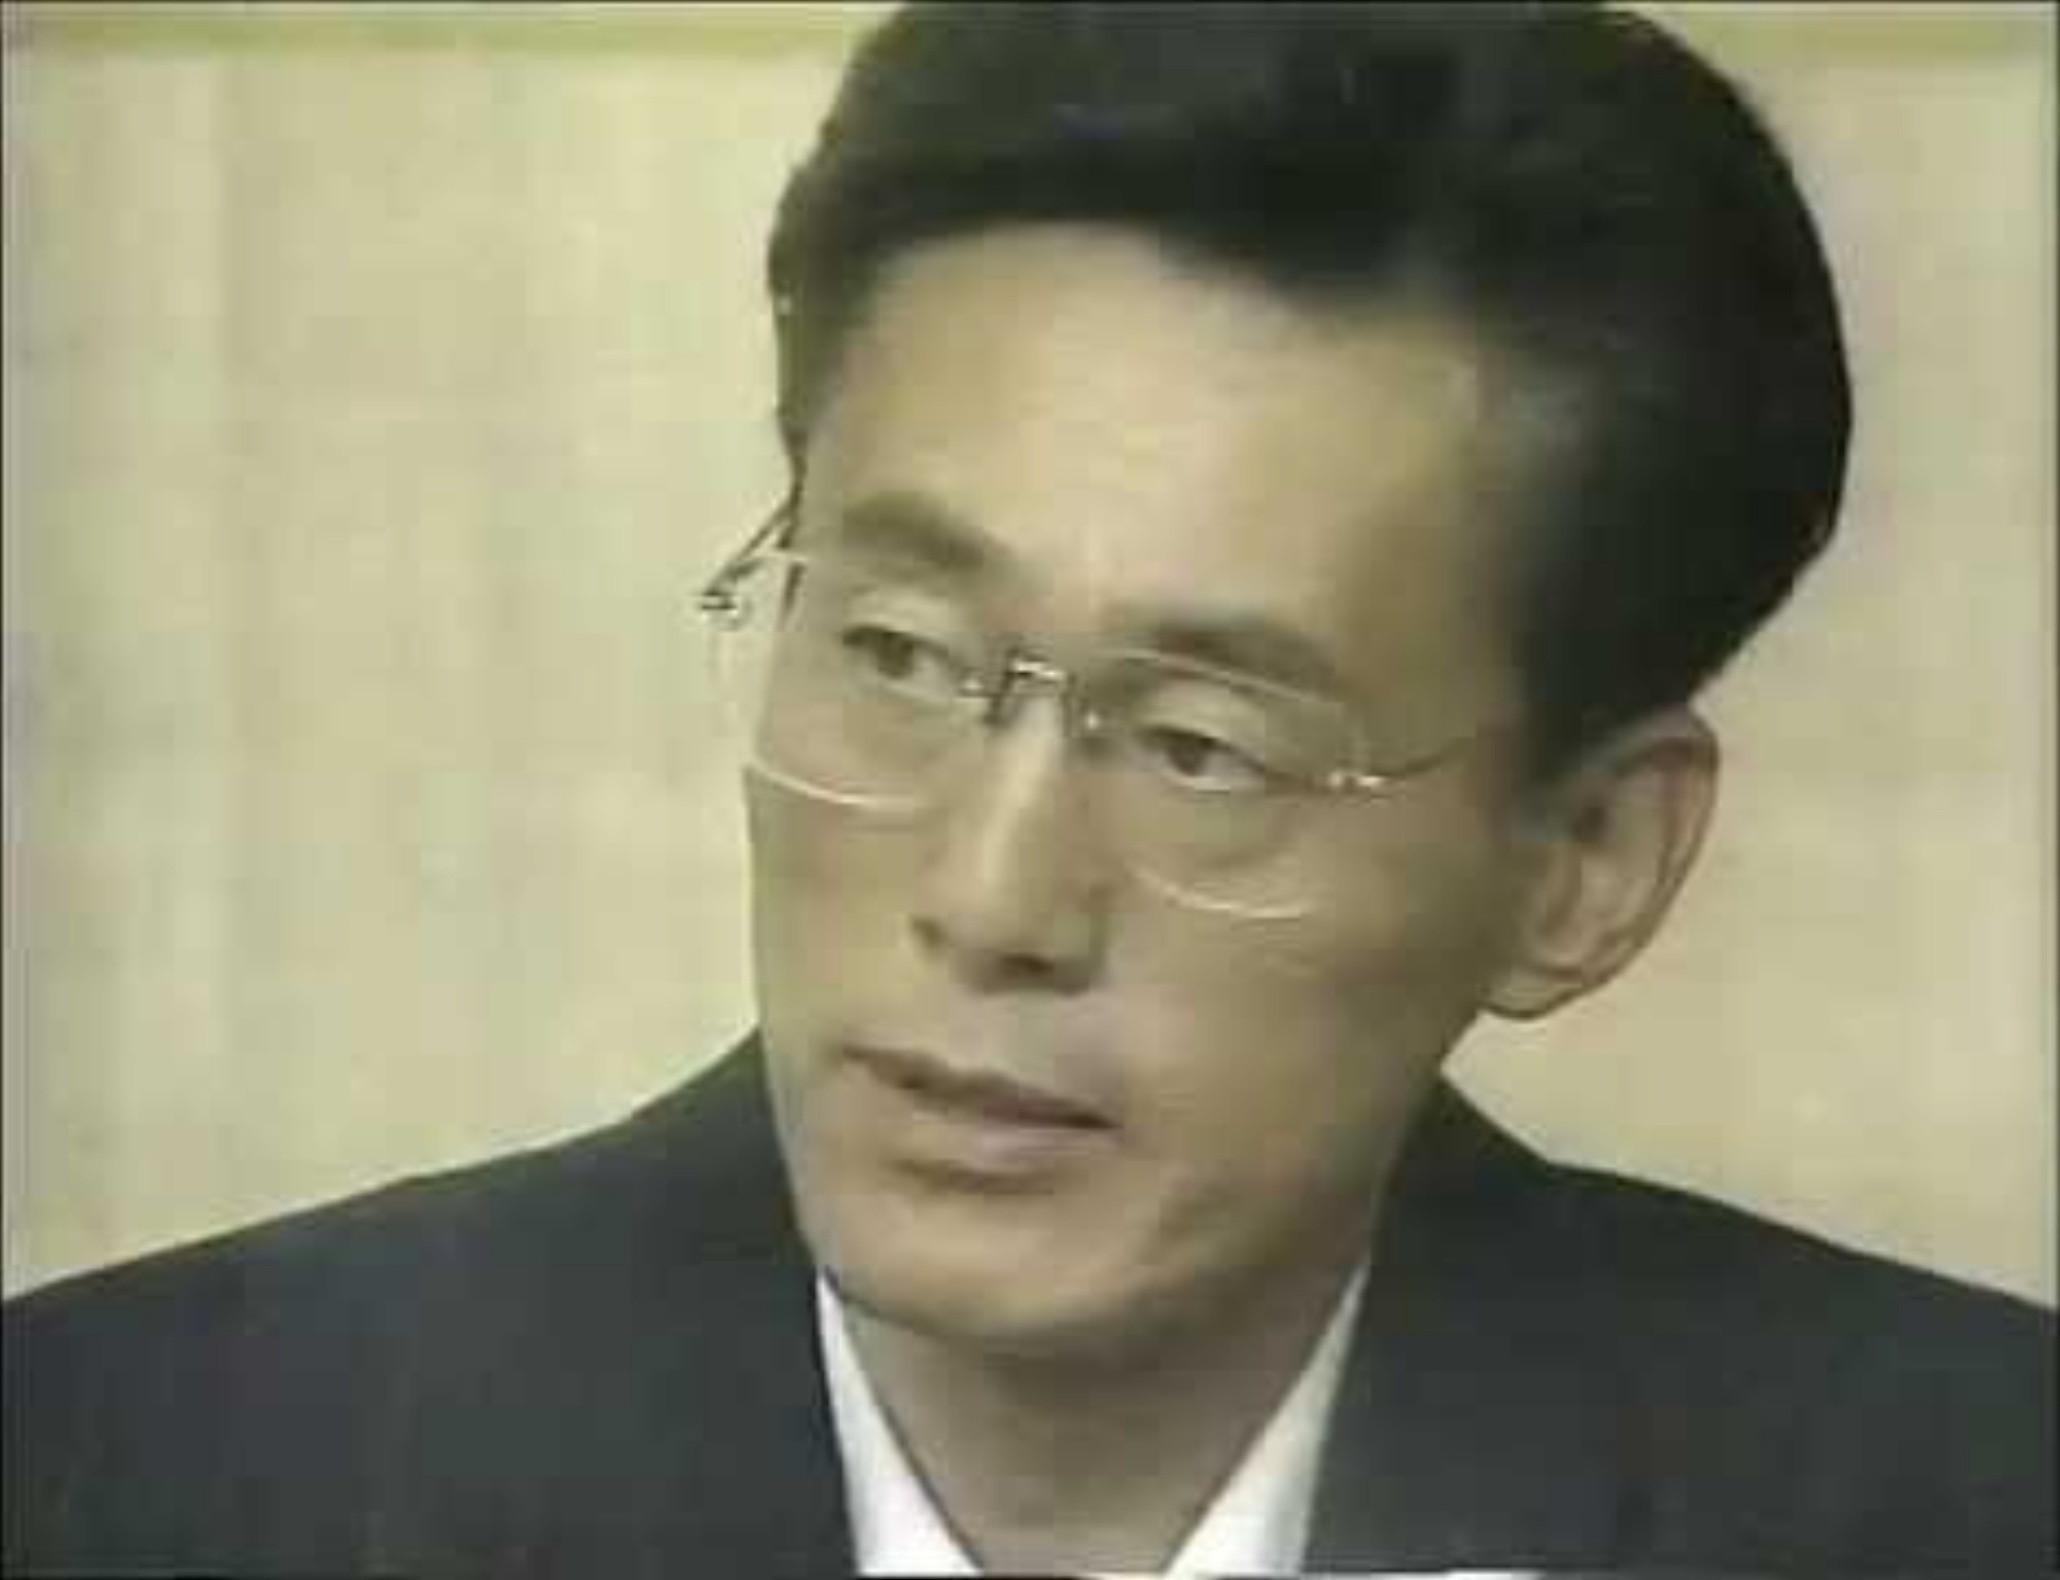 Masataka_Itsumi(1993/09/06)